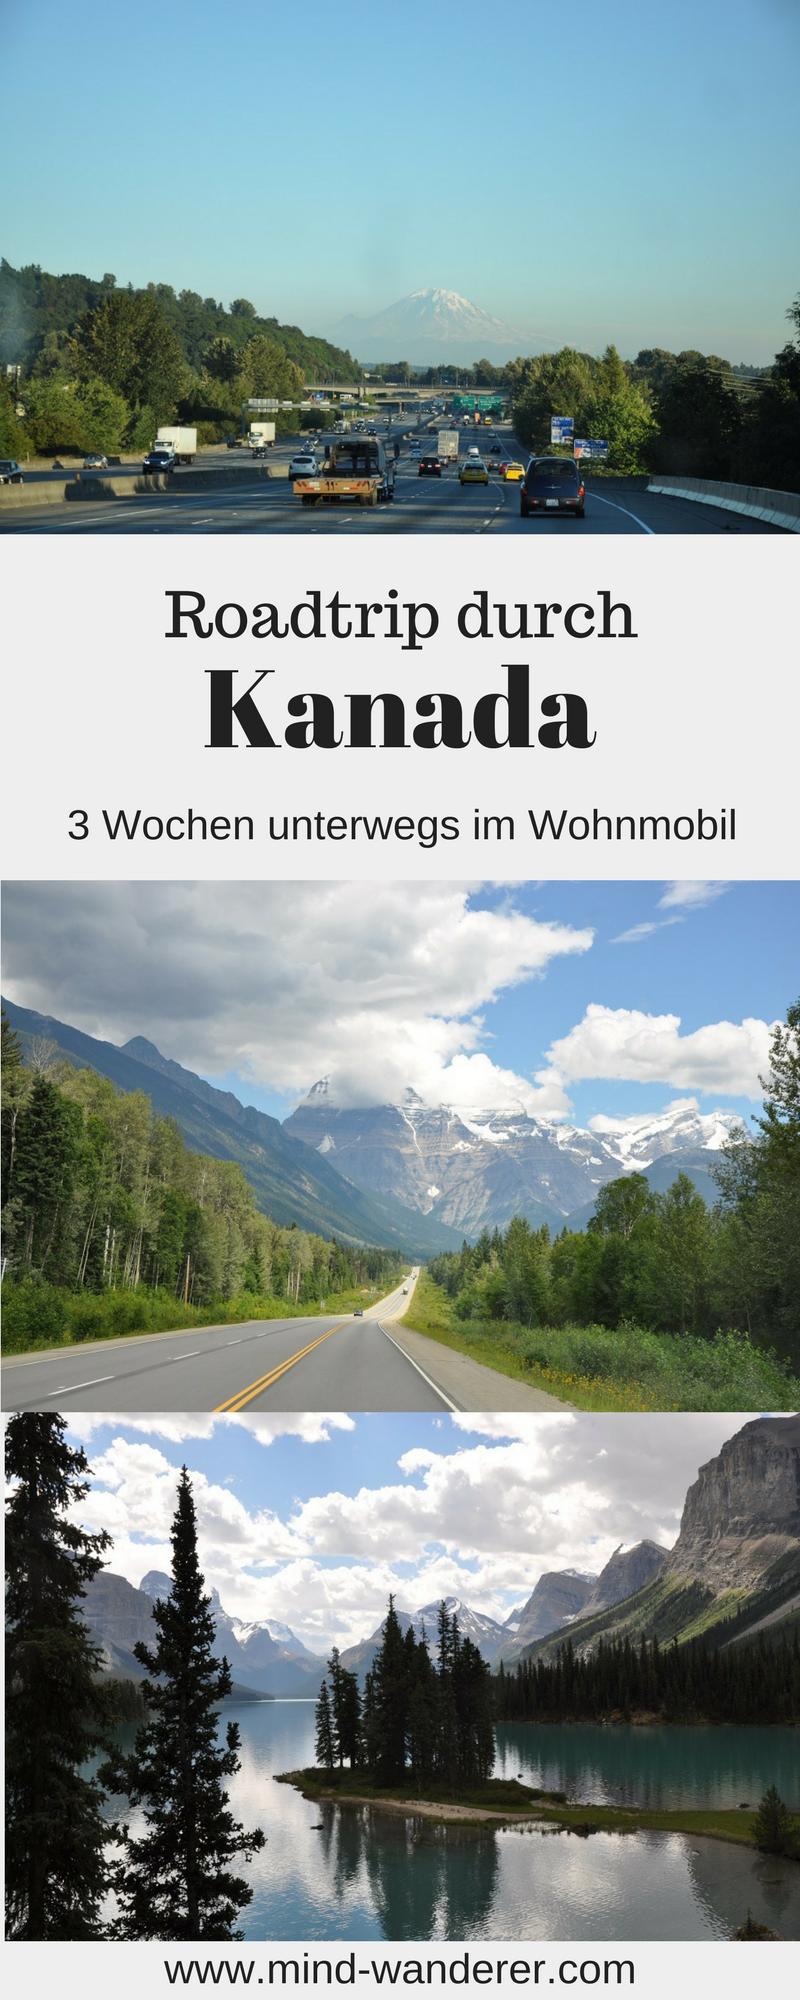 kanada reisen wohnmobil camper roadtrip travel guide canada nord amerika north america canada adventures #travelnorthamerica